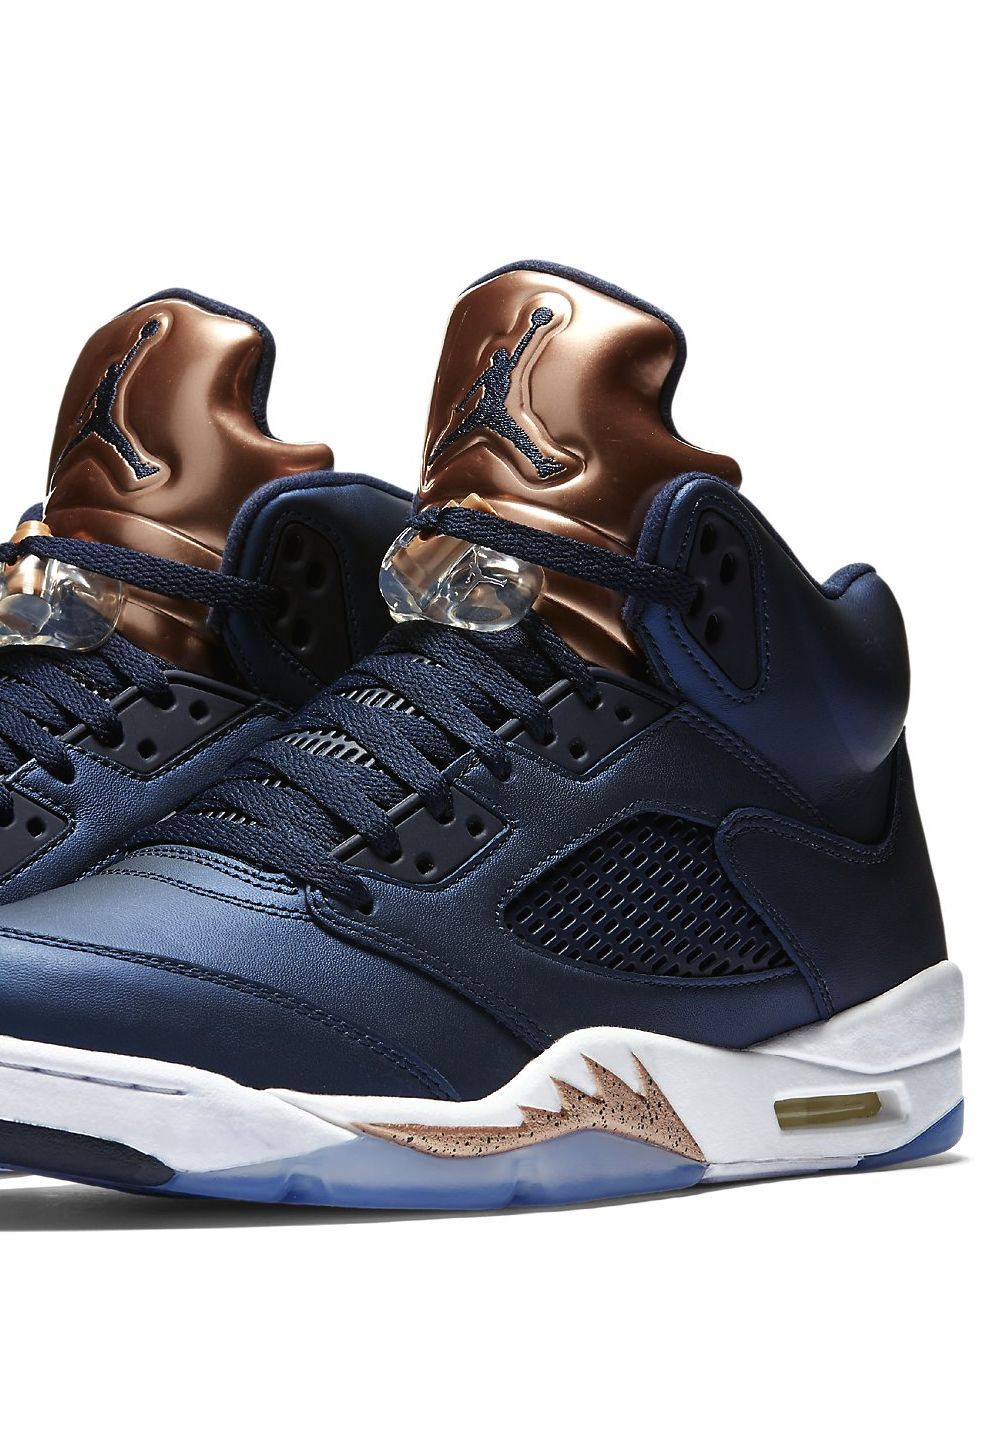 a08d2116bf2ebb AIR JORDAN RETRO 5 BRONZE  sneakernews  Sneakers  StreetStyle  Kicks